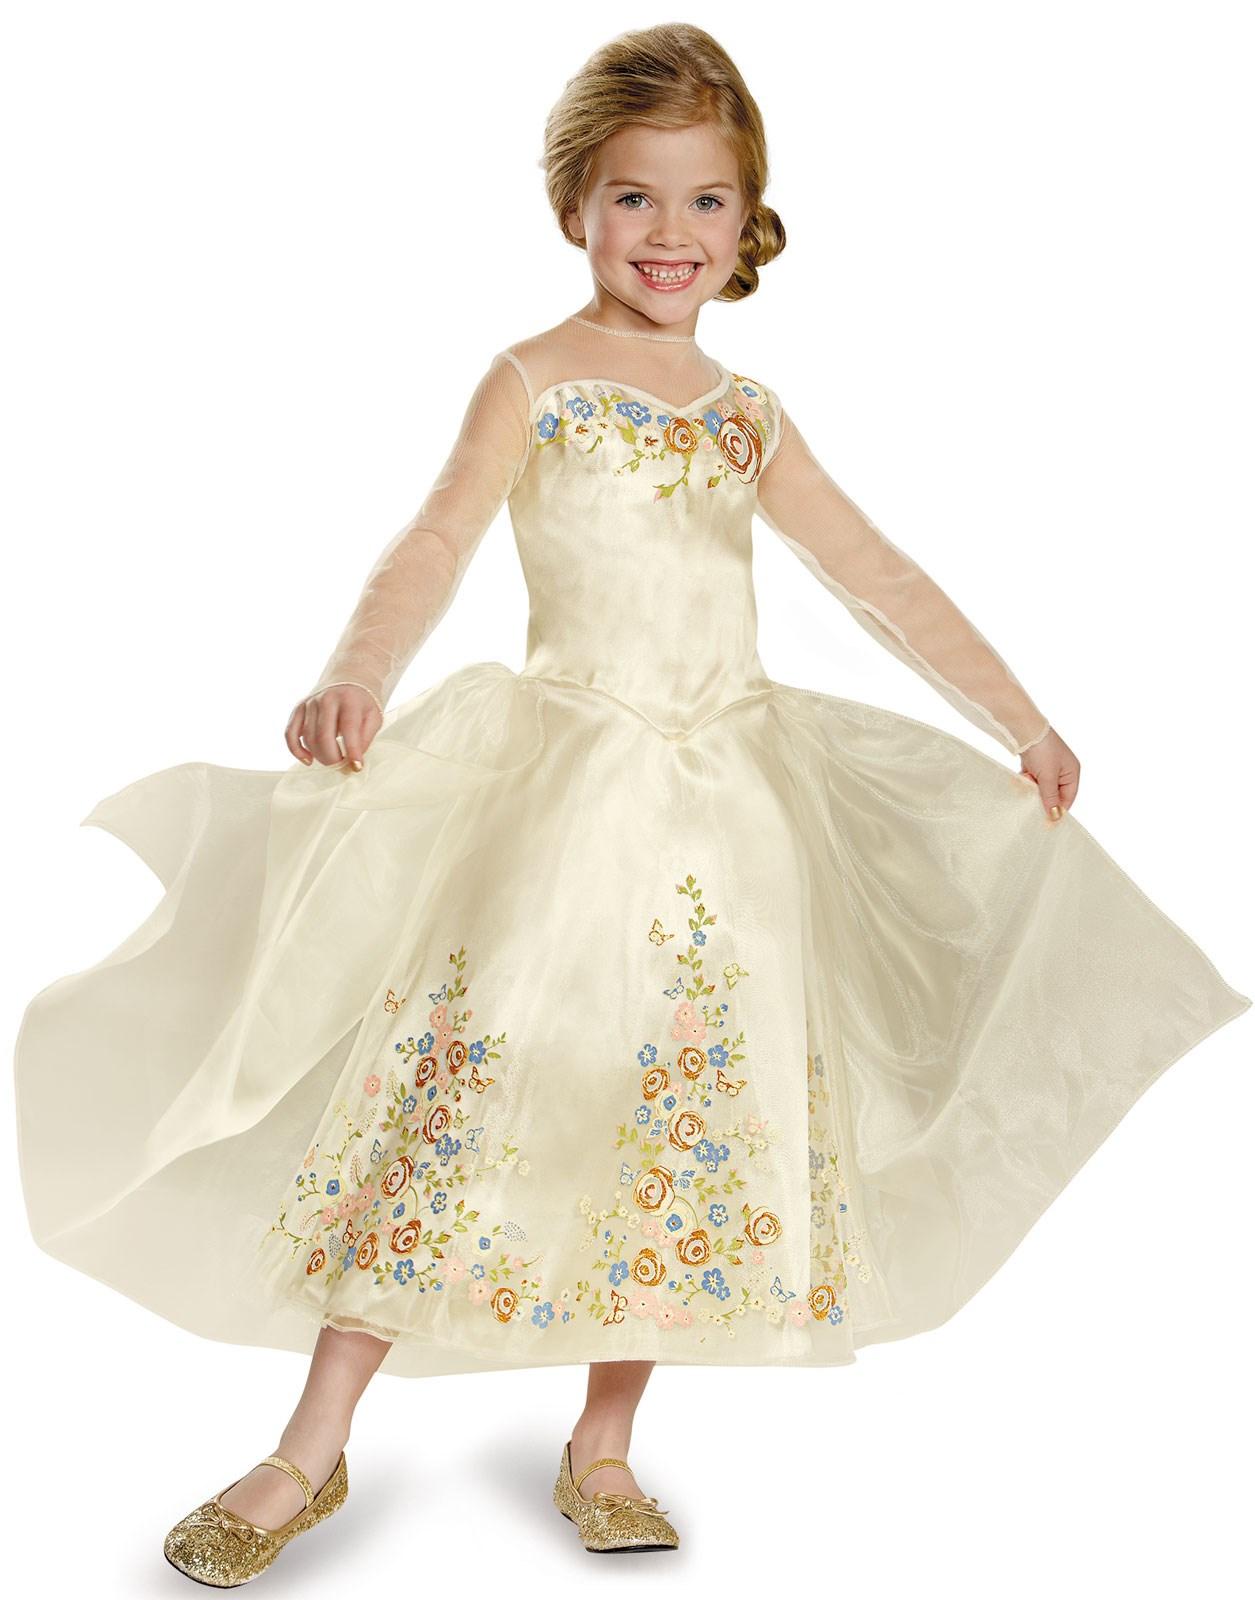 cinderella movie wedding dress deluxe kids costume